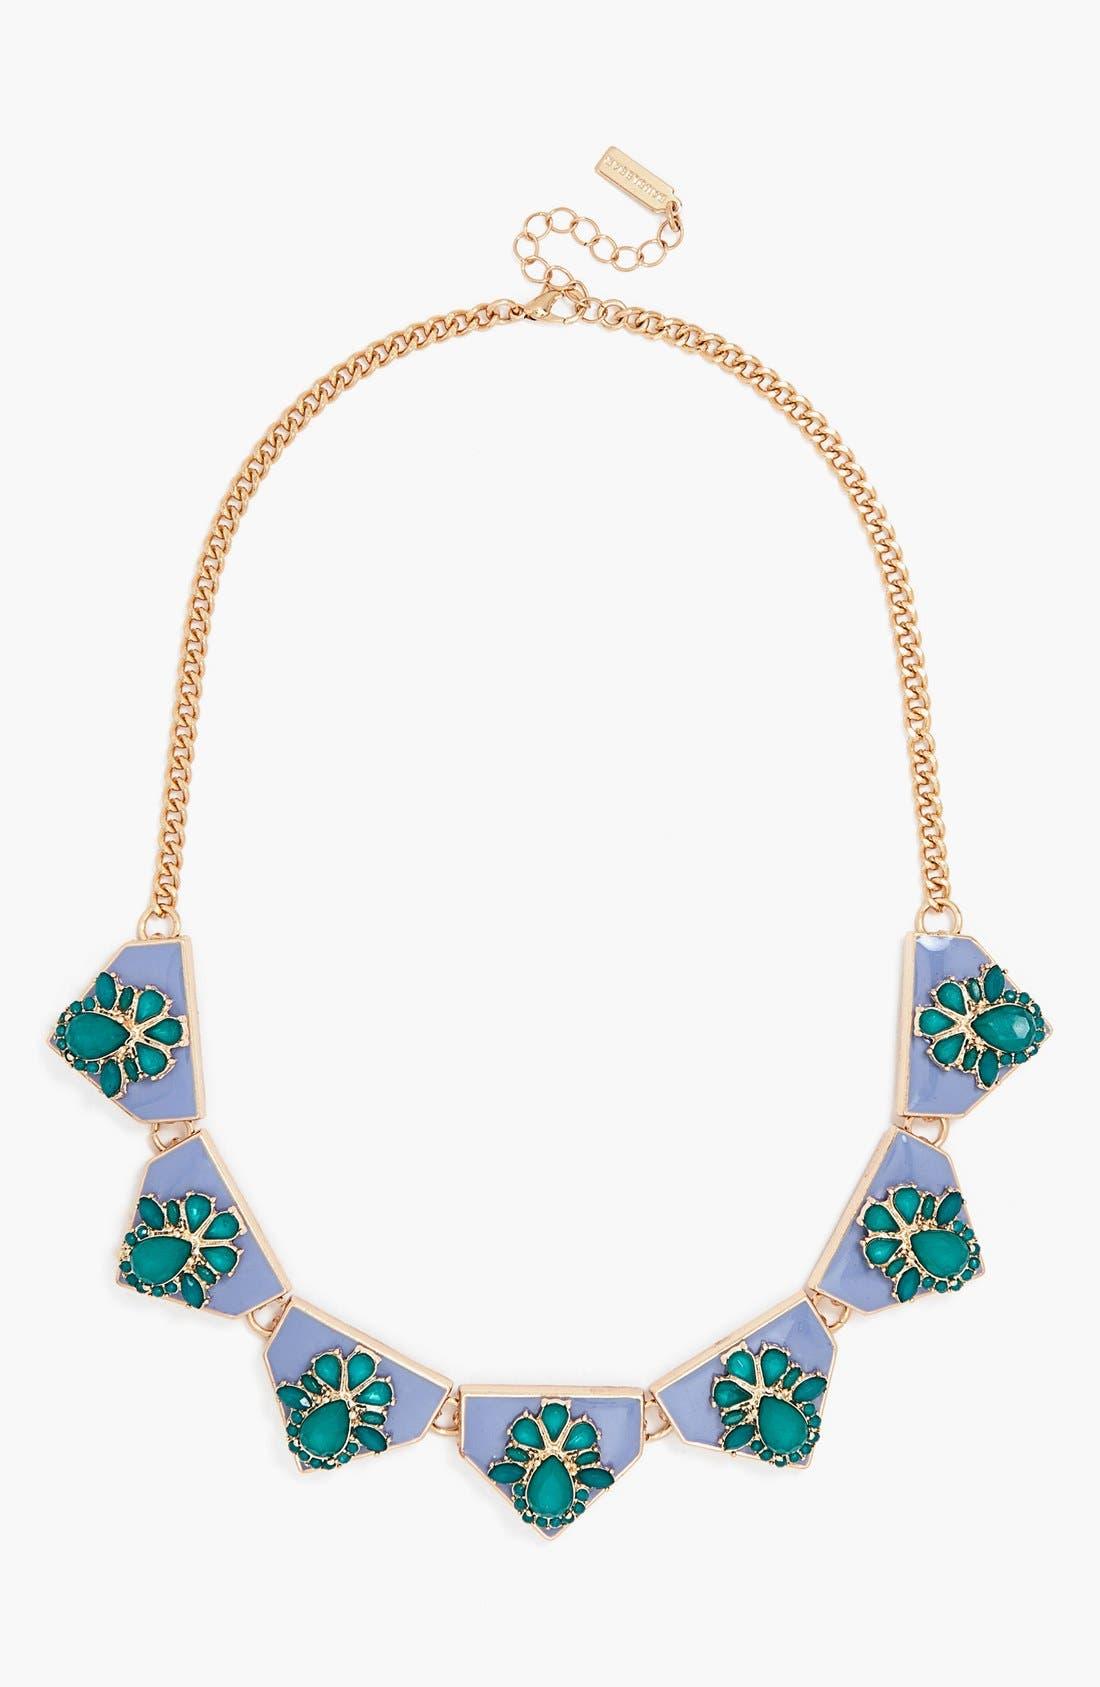 Main Image - BaubleBar 'Athena' Collar Necklace